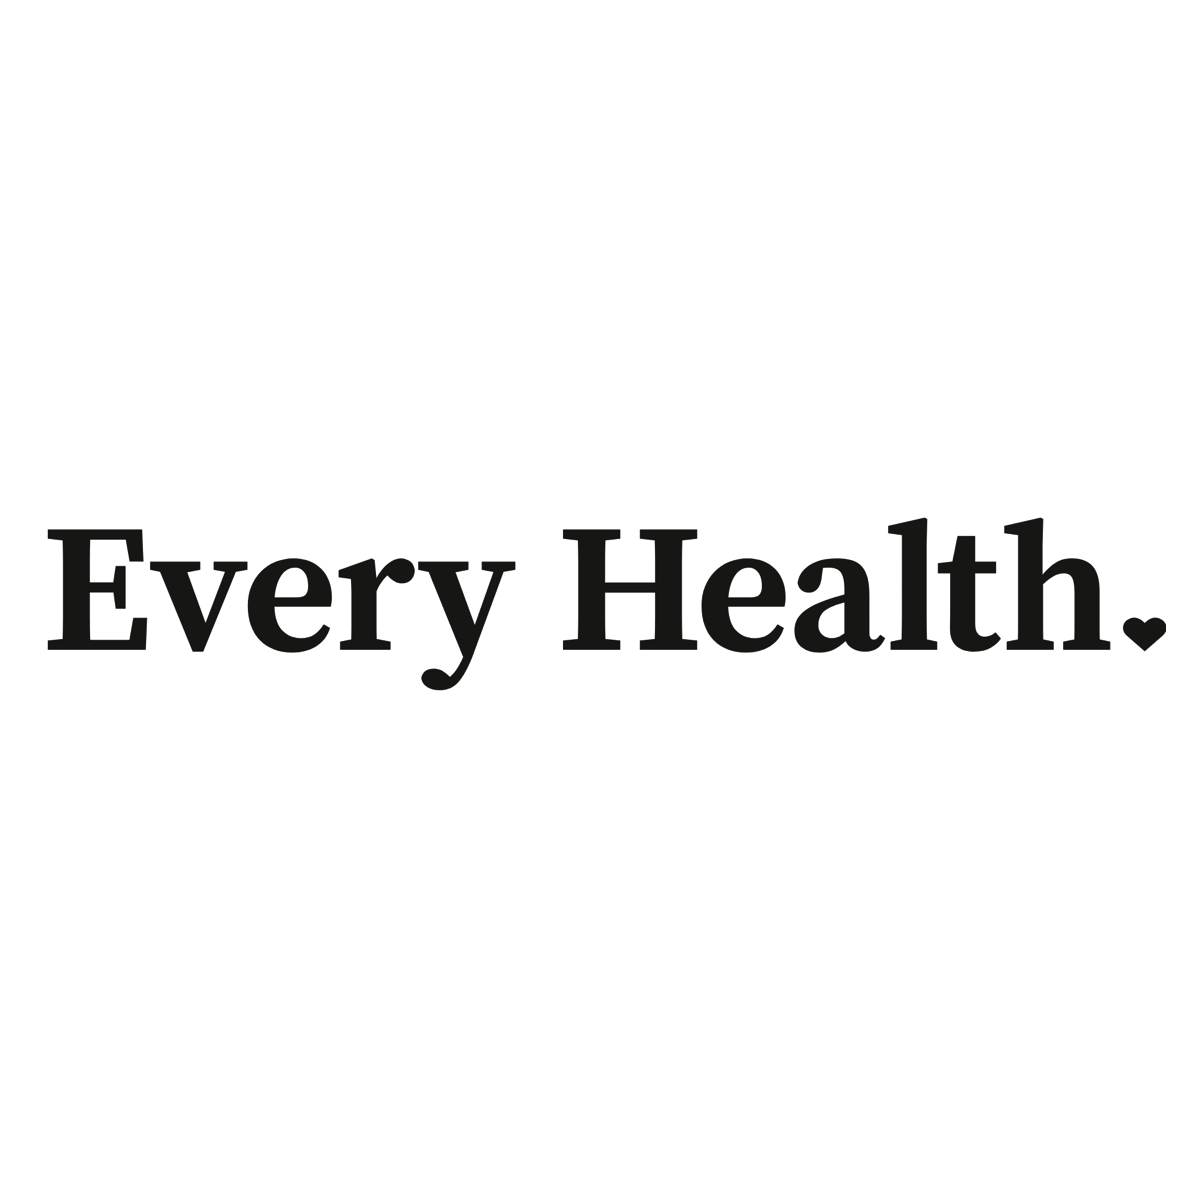 Every Health logo